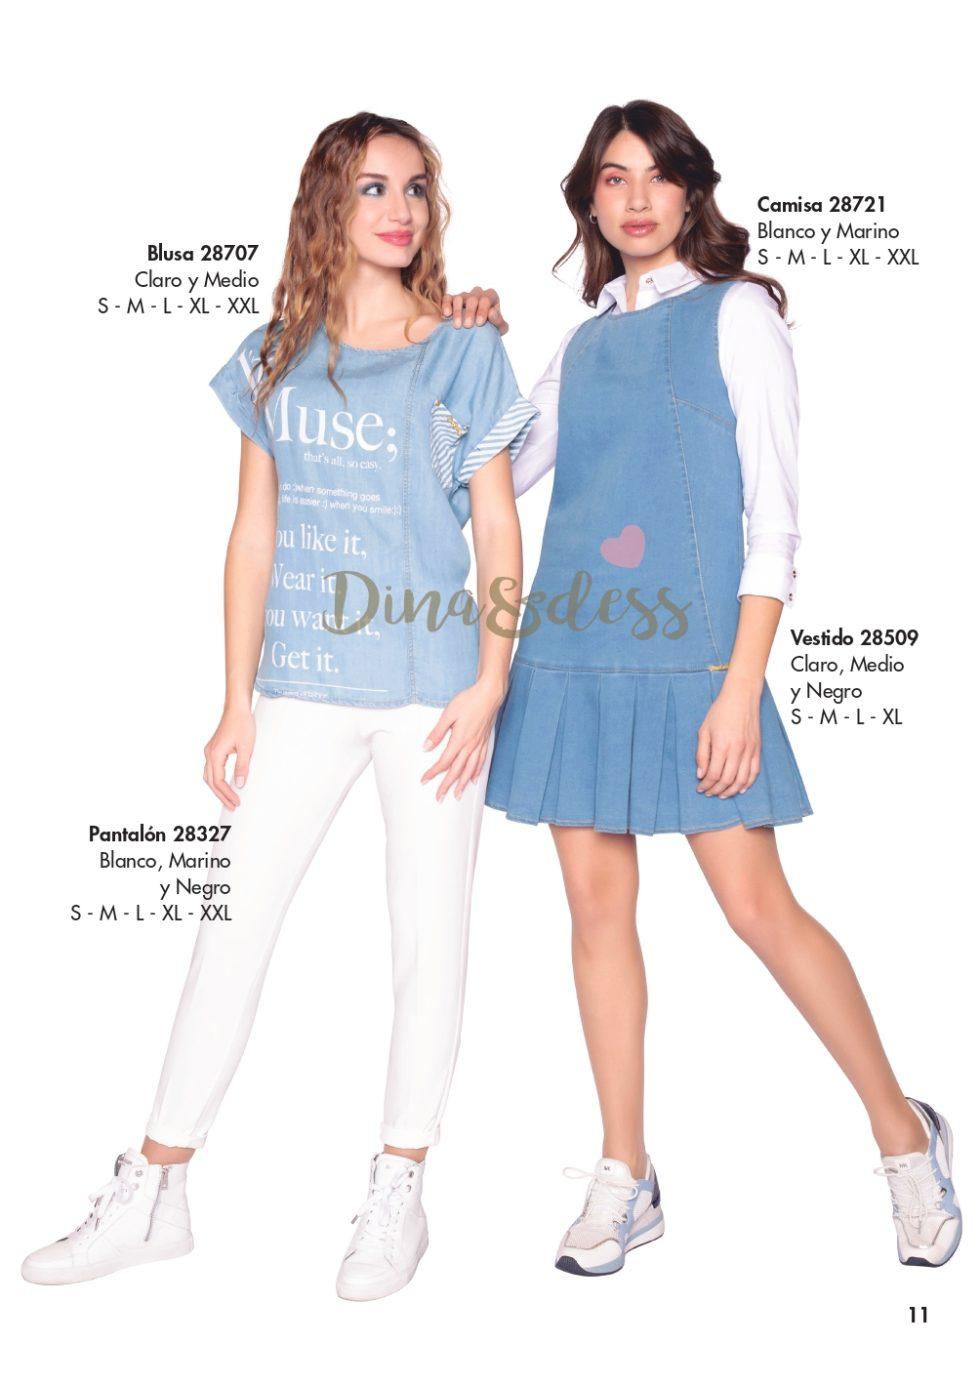 Verano 2021 Dina&Dess Clientes_page-0013